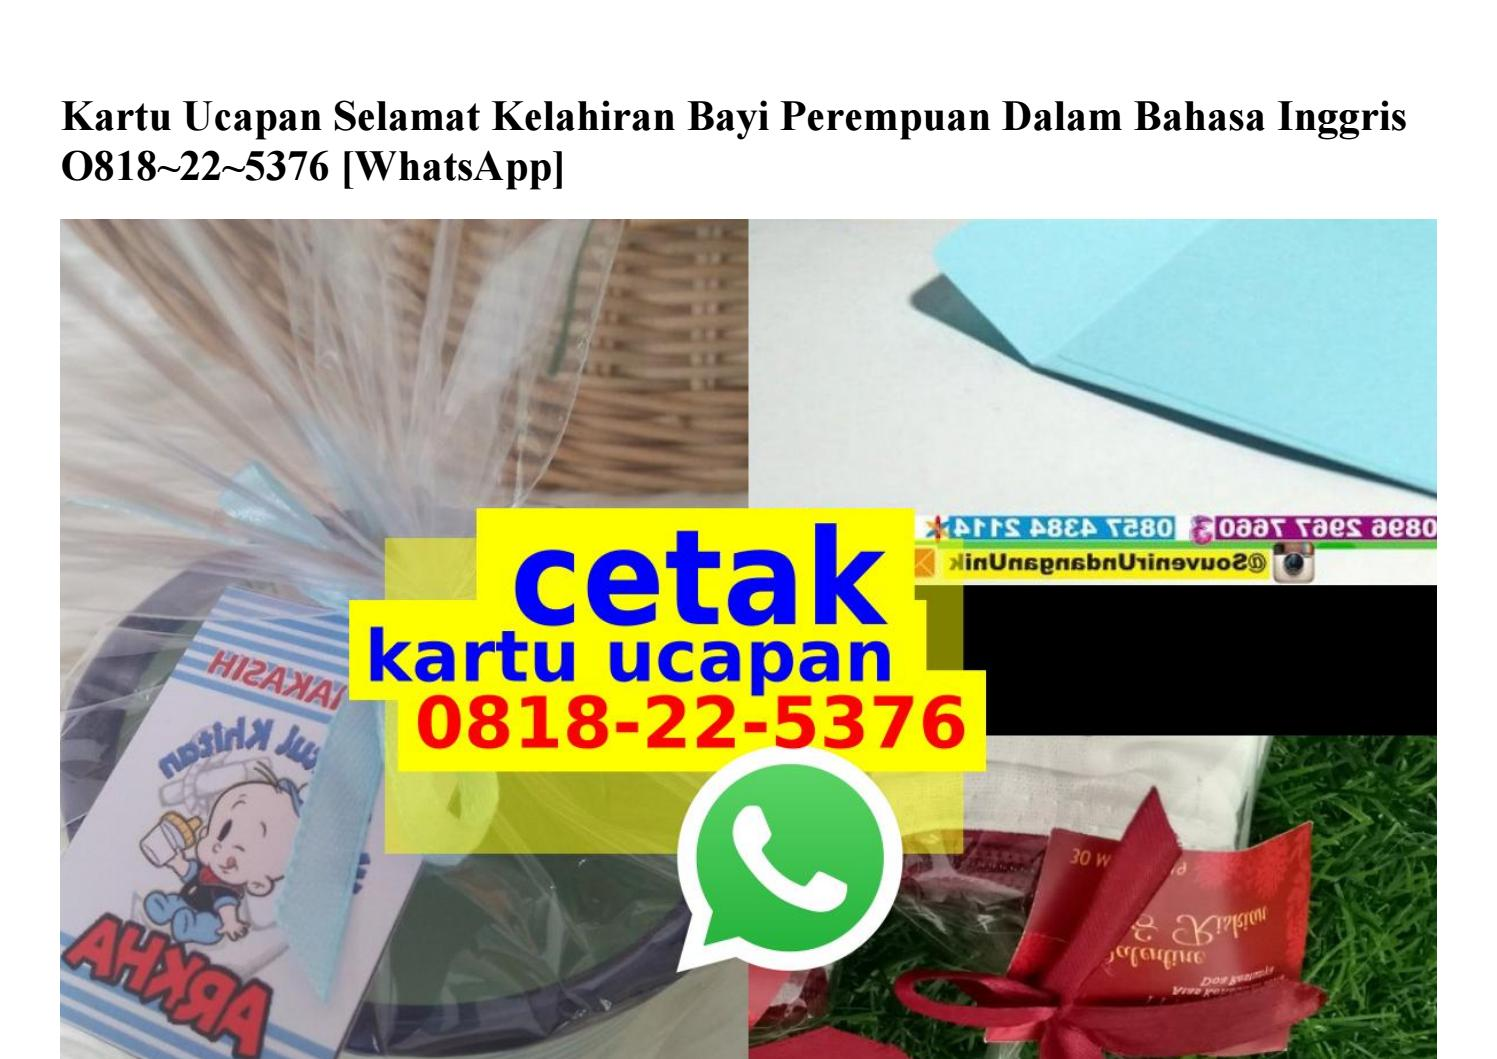 Kartu Ucapan Selamat Kelahiran Bayi Perempuan Dalam Bahasa Inggris 0818 22 5376 Wa By Gandaria Mengkudu Issuu